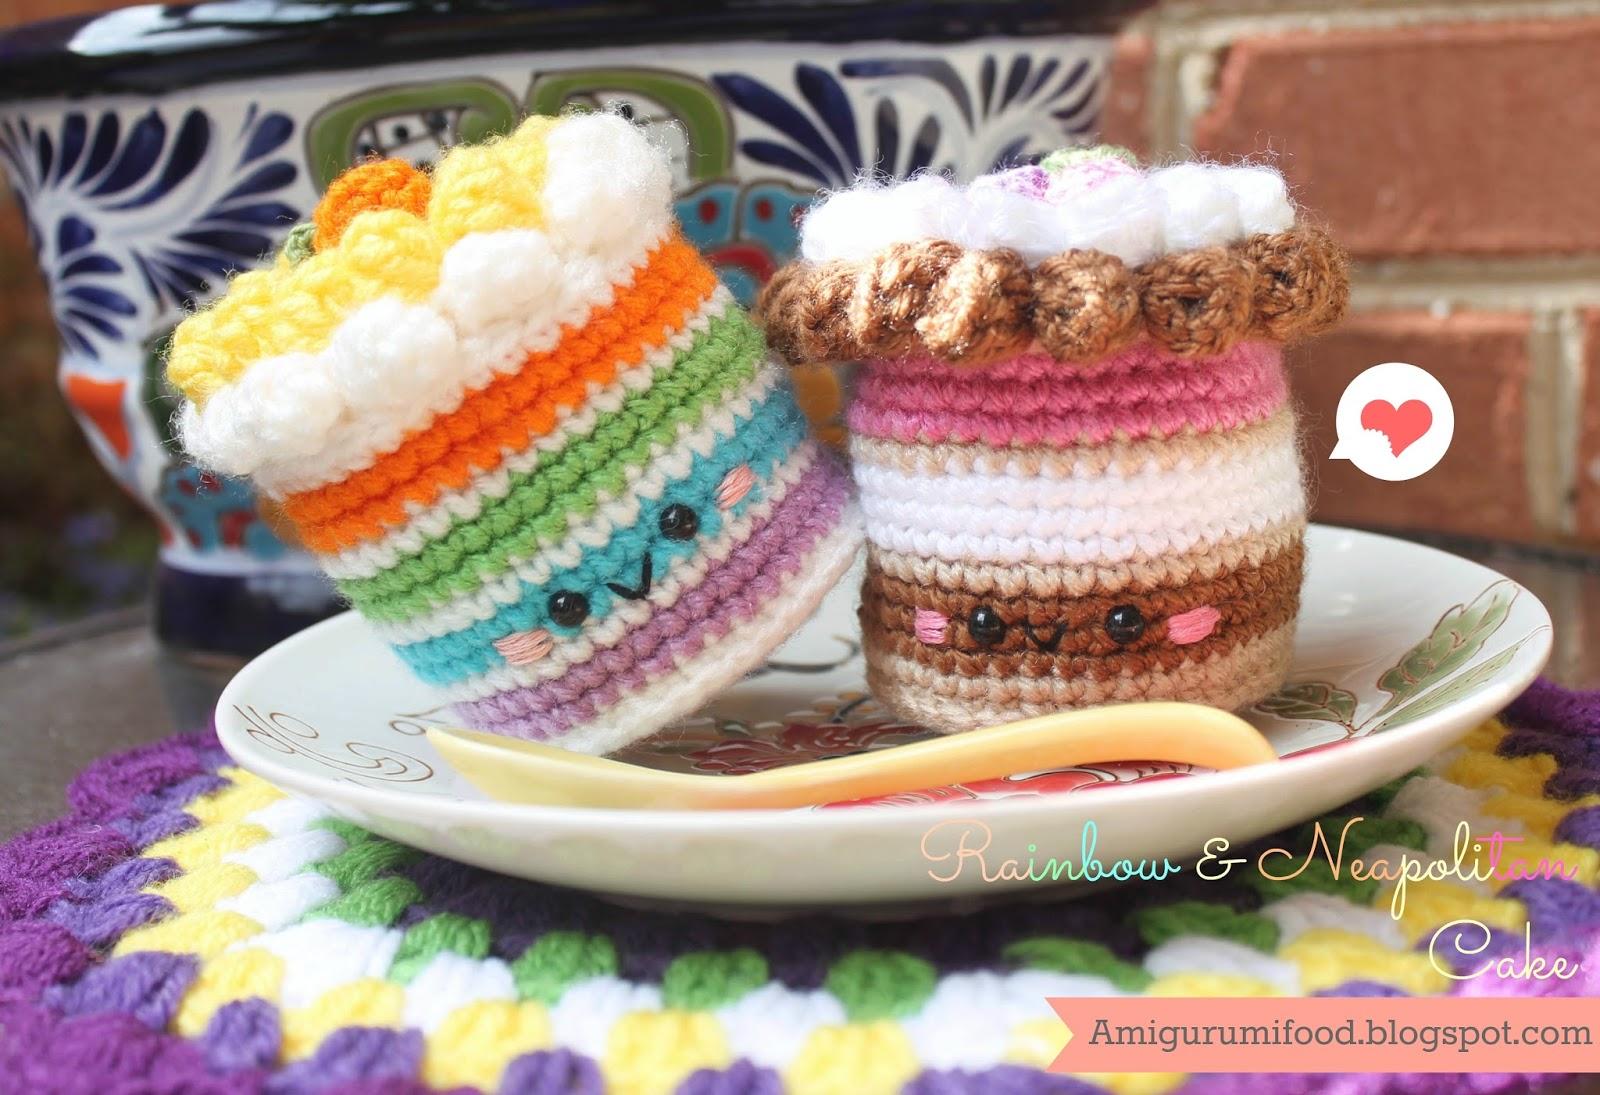 Amigurumi Harry Potter Free Pattern : Amigurumi Food: Rainbow & Neapolitan Cake Free pattern!